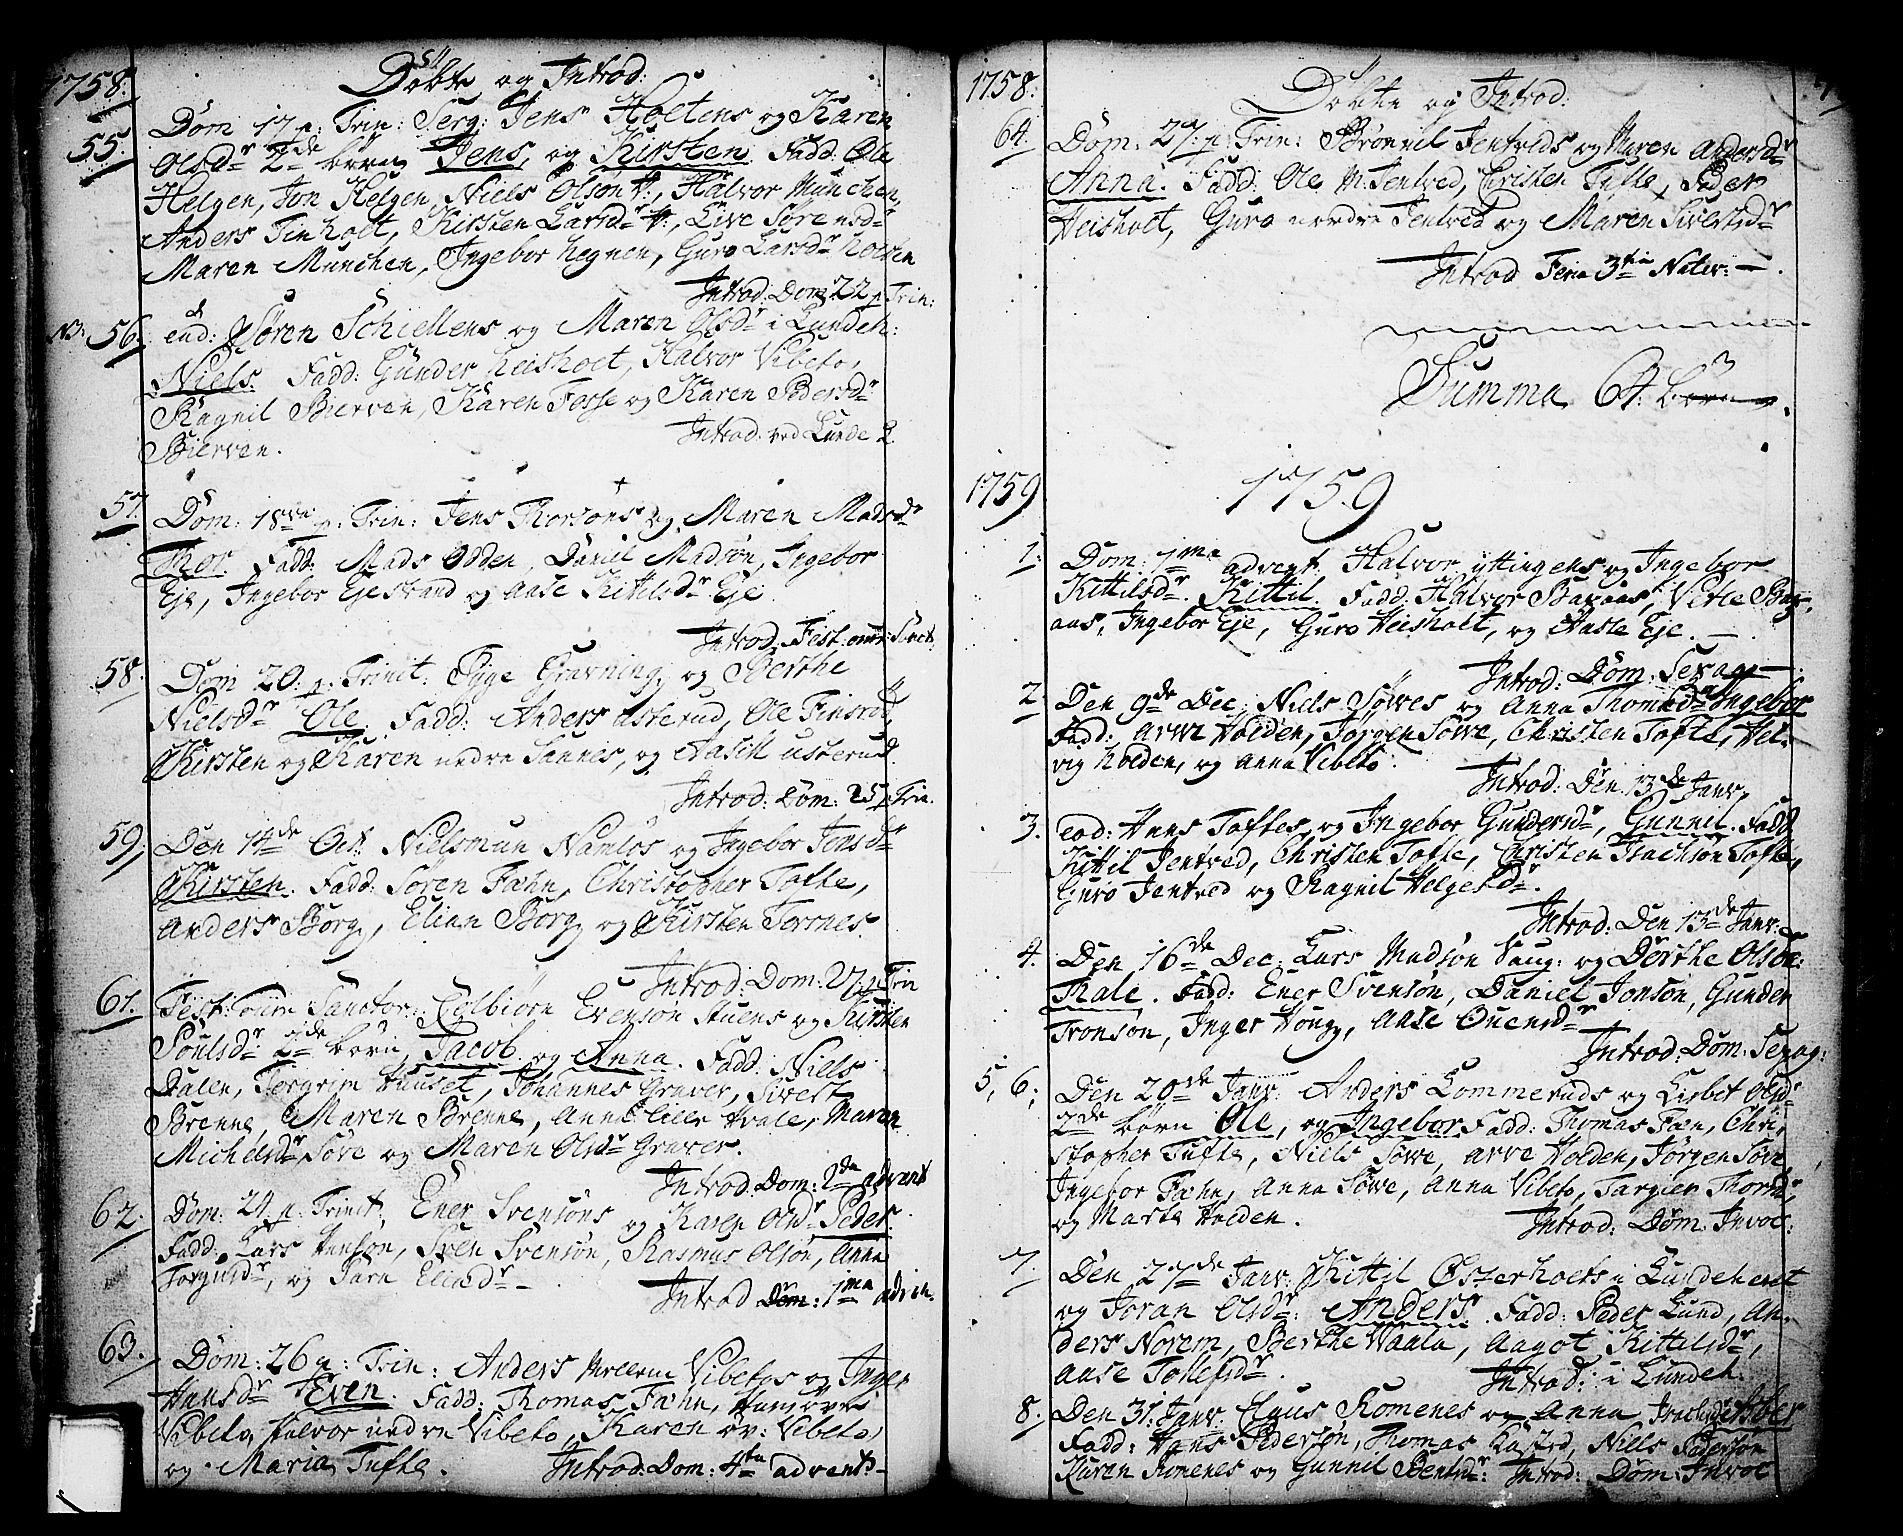 SAKO, Holla kirkebøker, F/Fa/L0001: Ministerialbok nr. 1, 1717-1779, s. 77